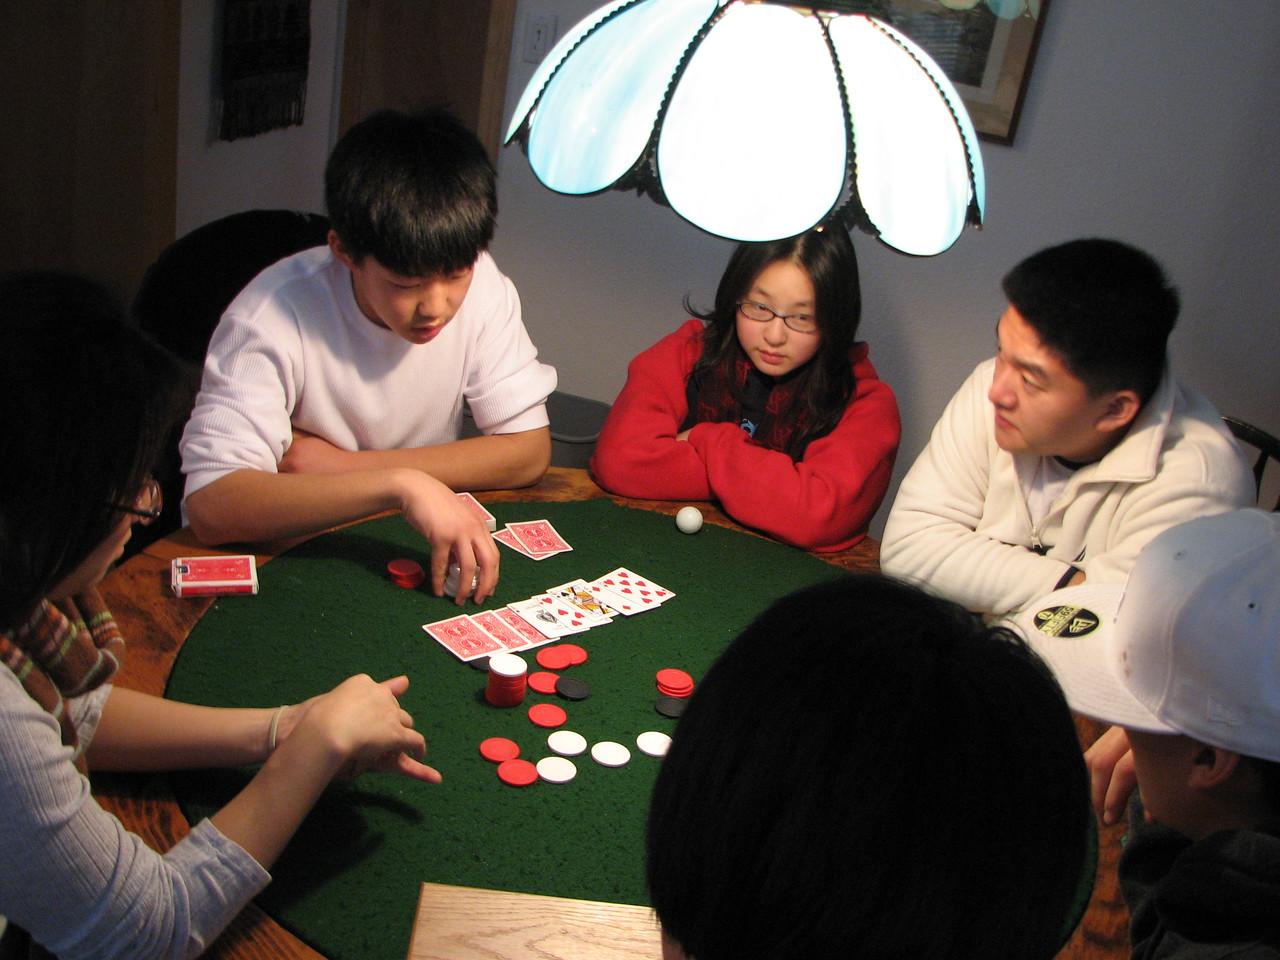 2006 12 20 Wed - Shinae Kim, Jay Lee, Angela Hsu, Dan Tung, & Ted Hong hold 'em Texas 2